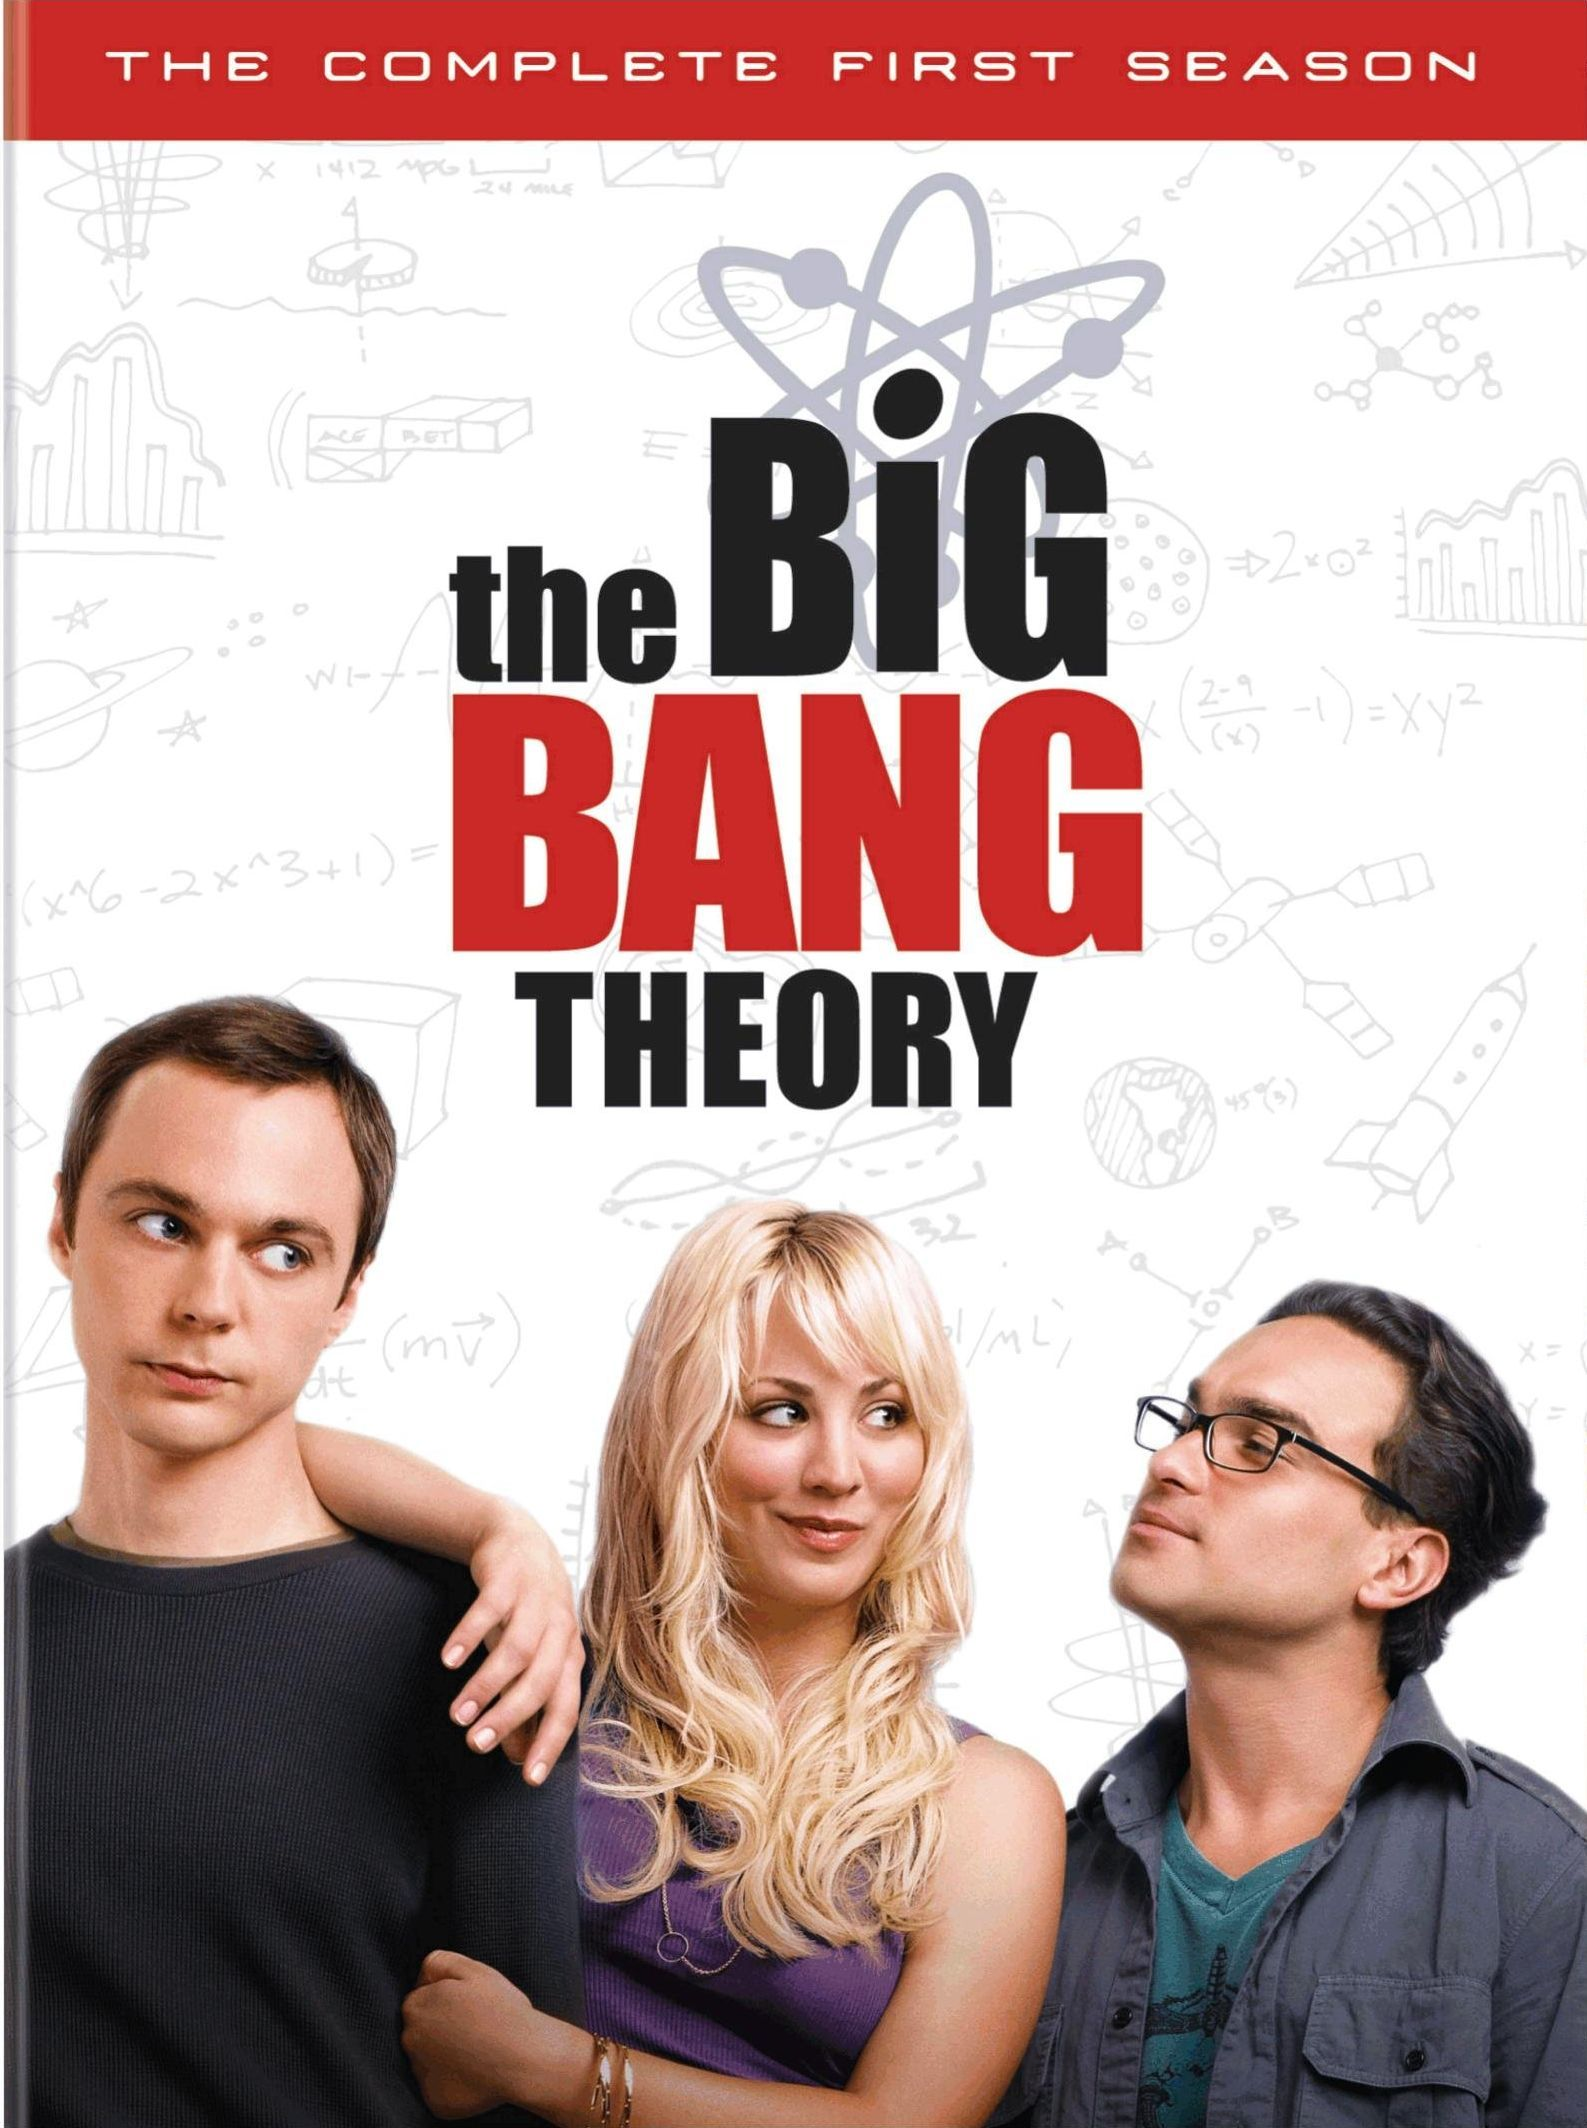 The Big Bang Theory Season 1   Series que me gustan   Pinterest ...